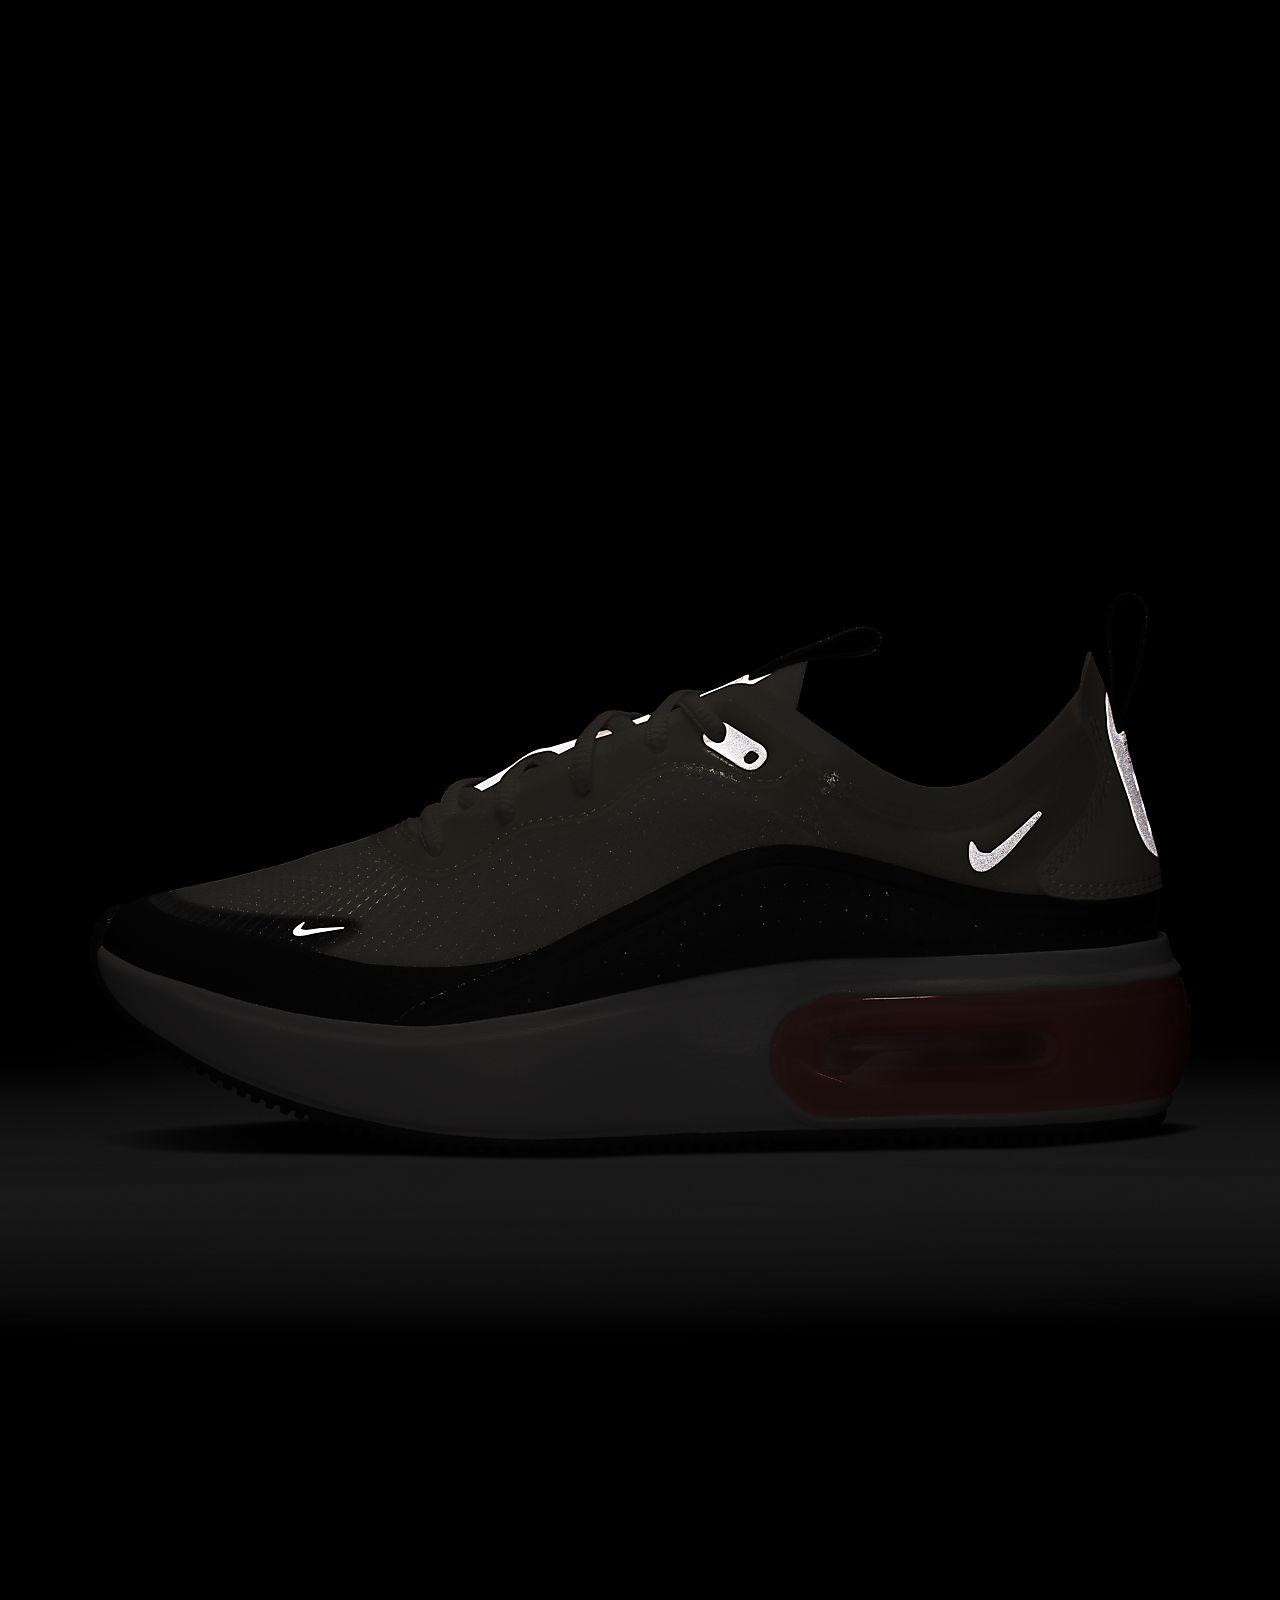 check out b3409 4c2b4 ... Nike Air Max Dia SE Shoe